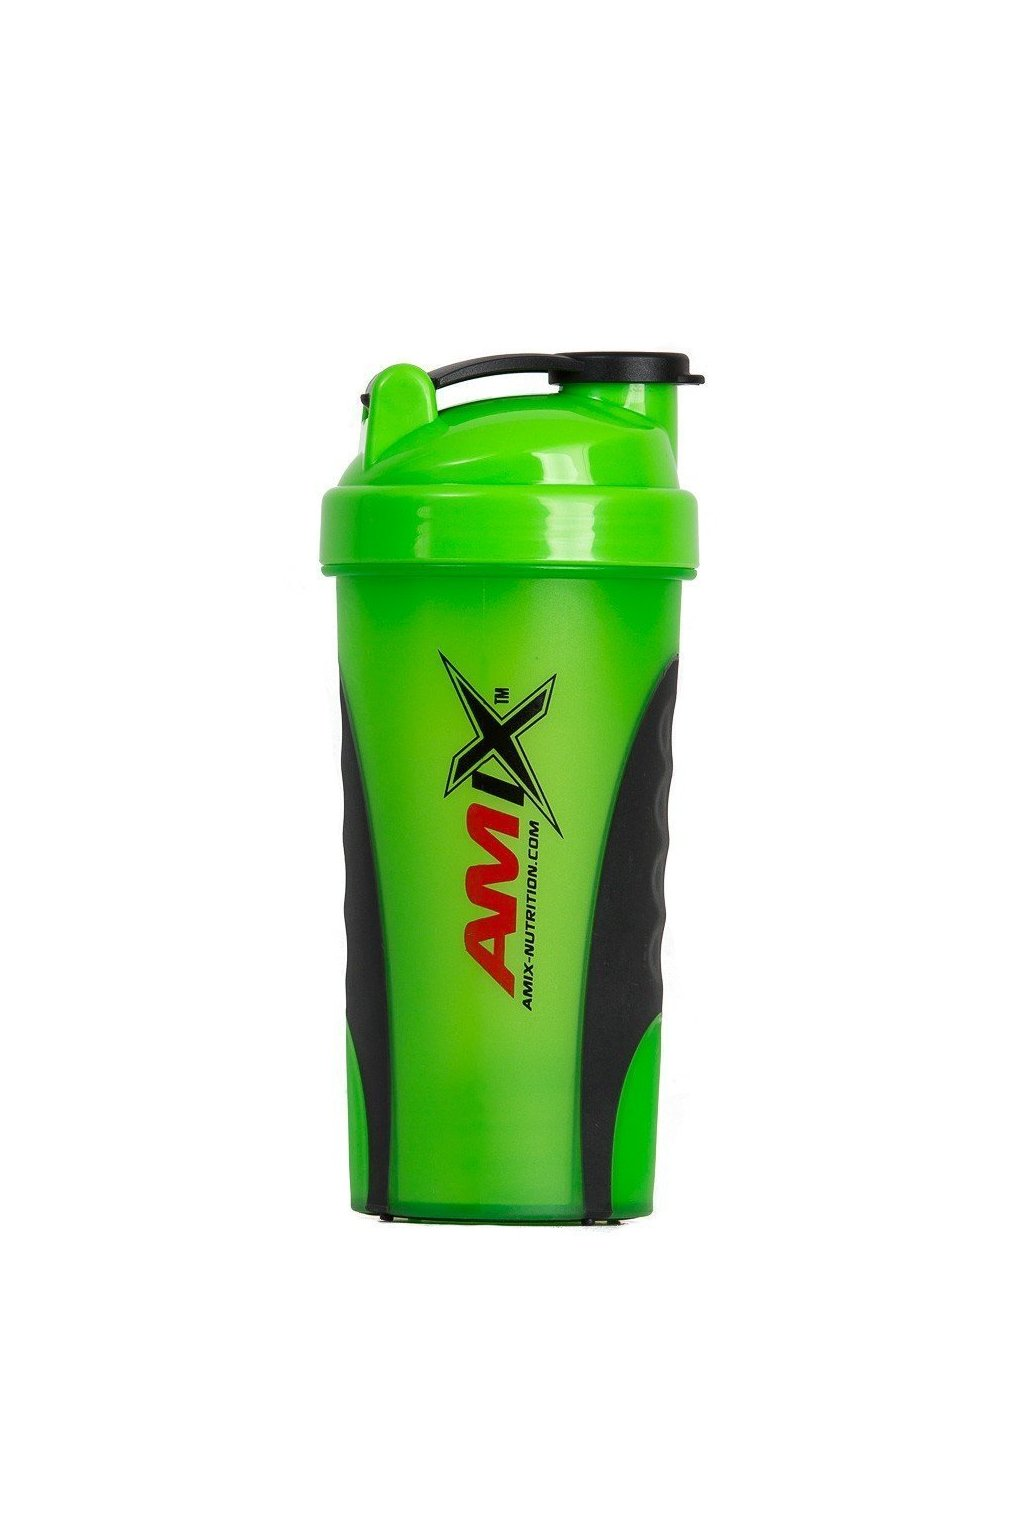 AX 00253 green 7